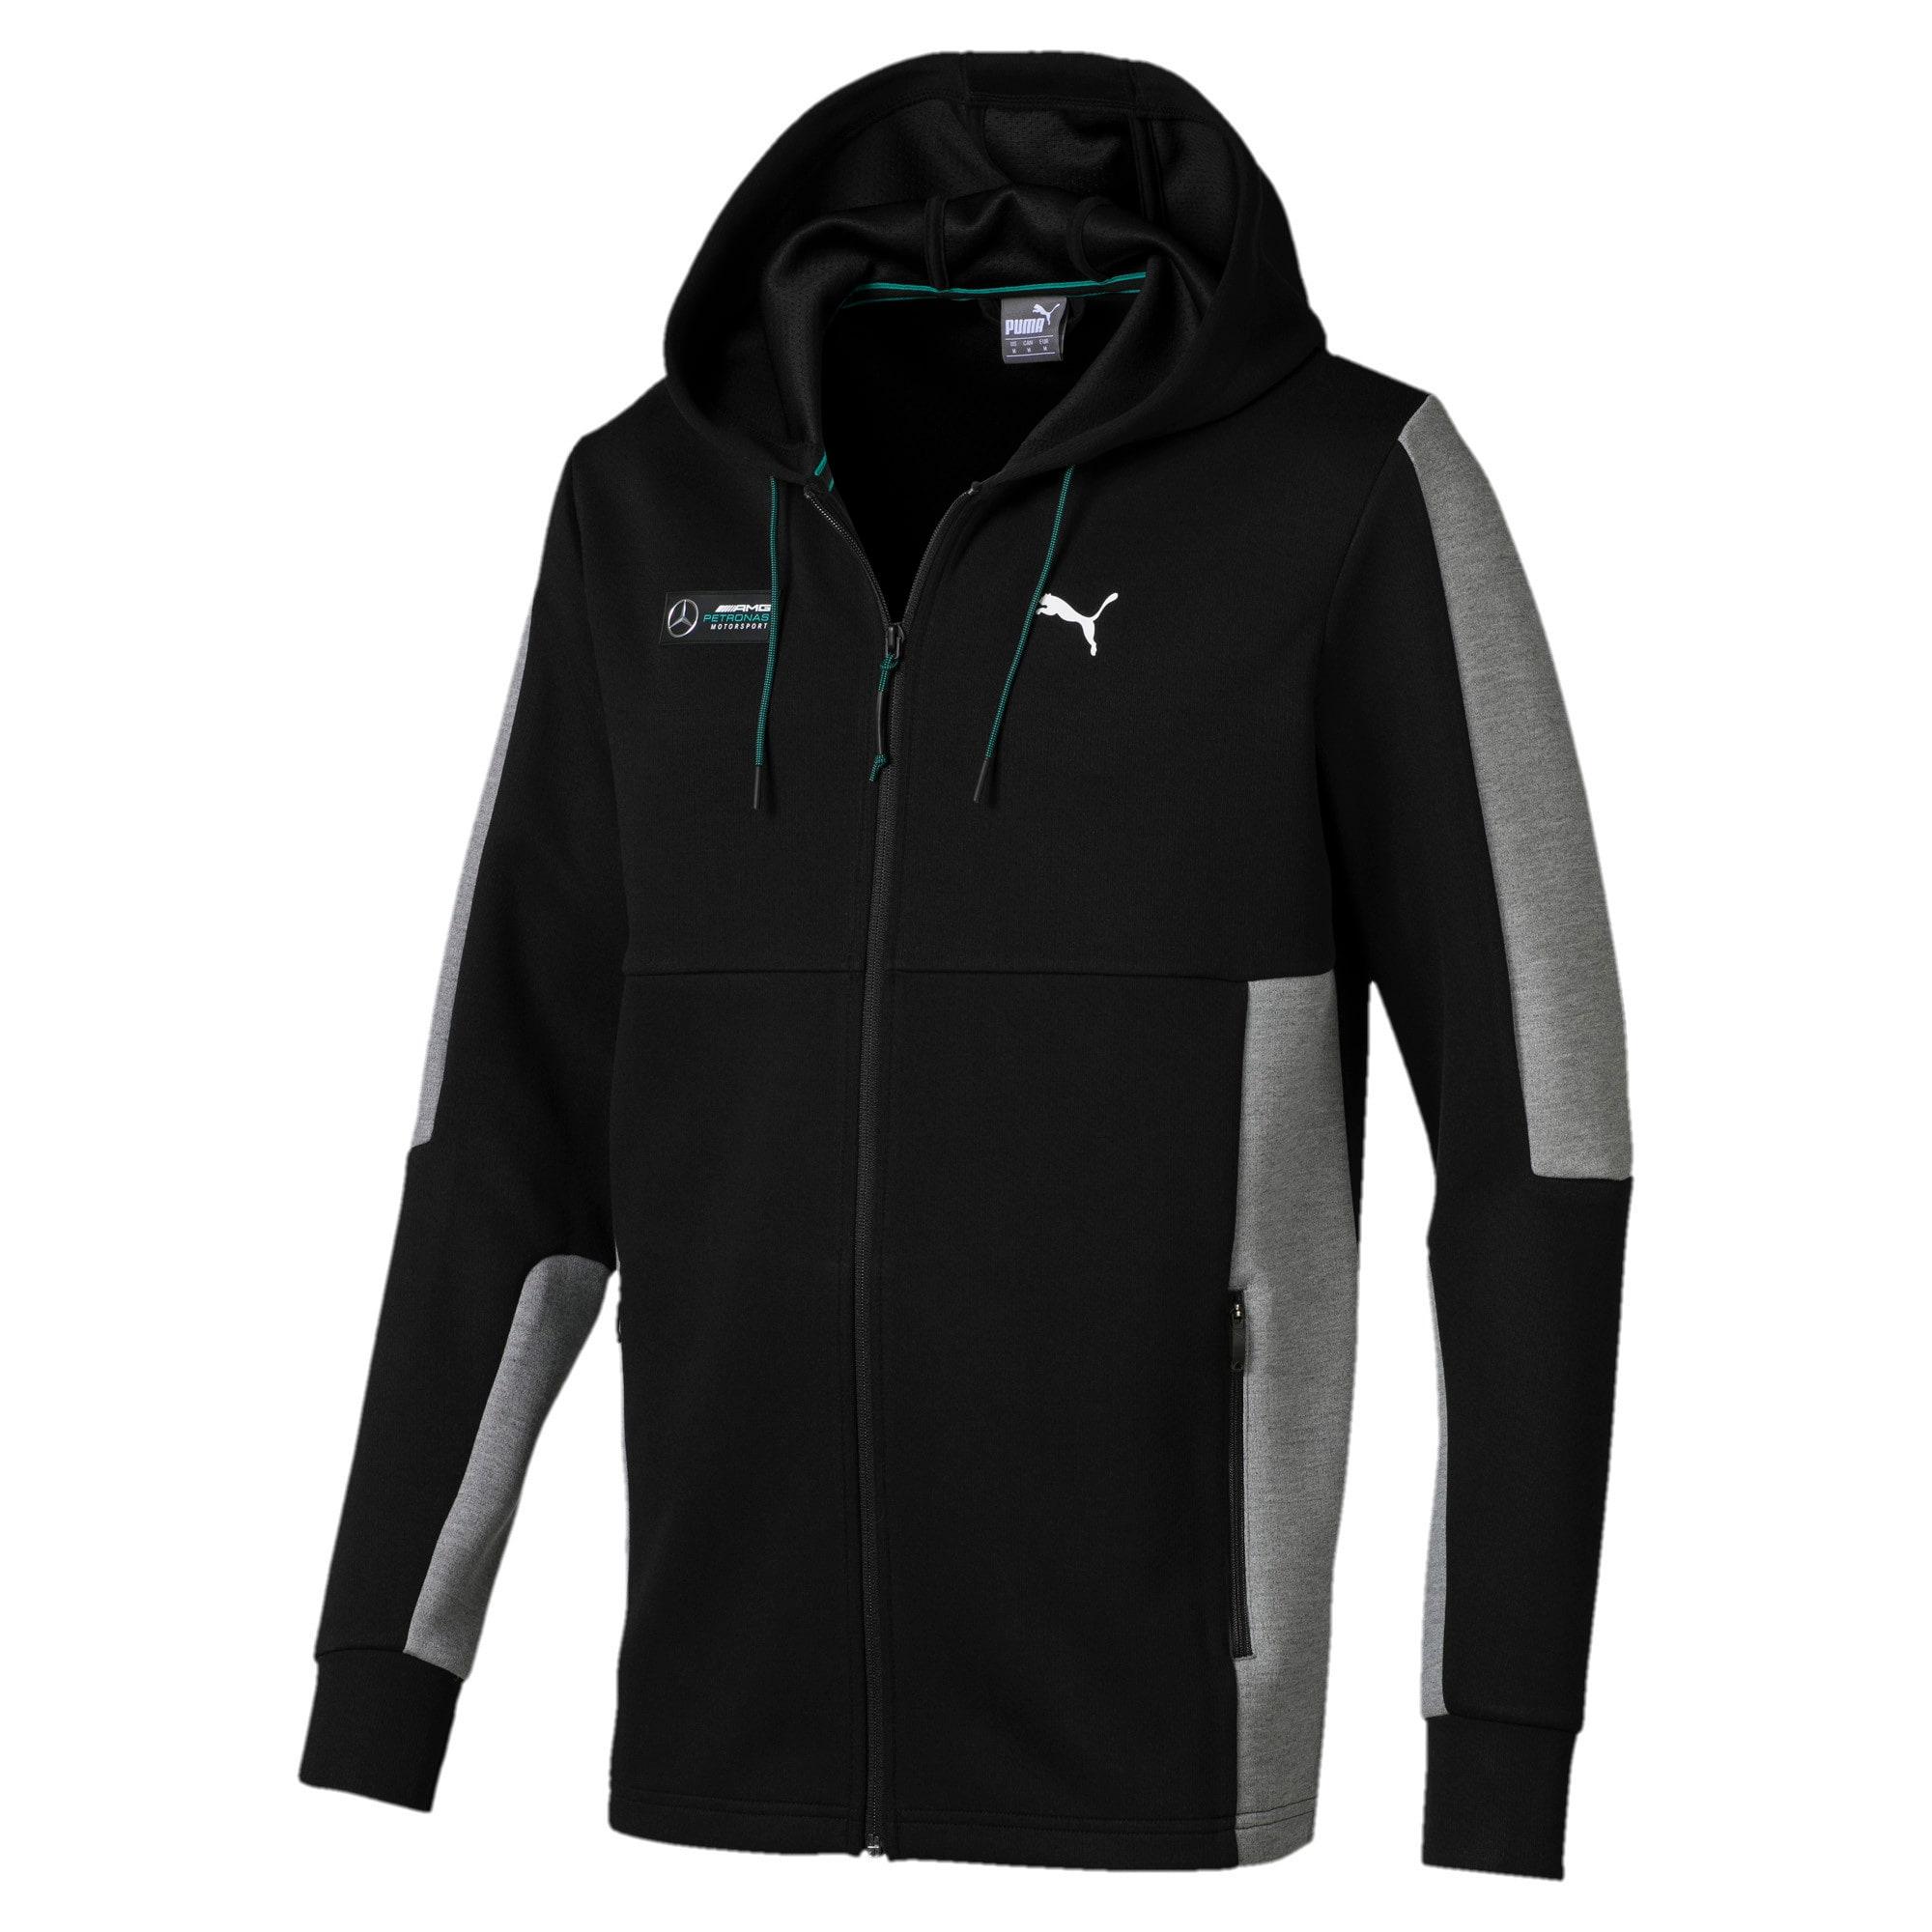 Thumbnail 3 of Mercedes AMG Petronas Motorsport Men's Sweat Jacket, Puma Black, medium-IND